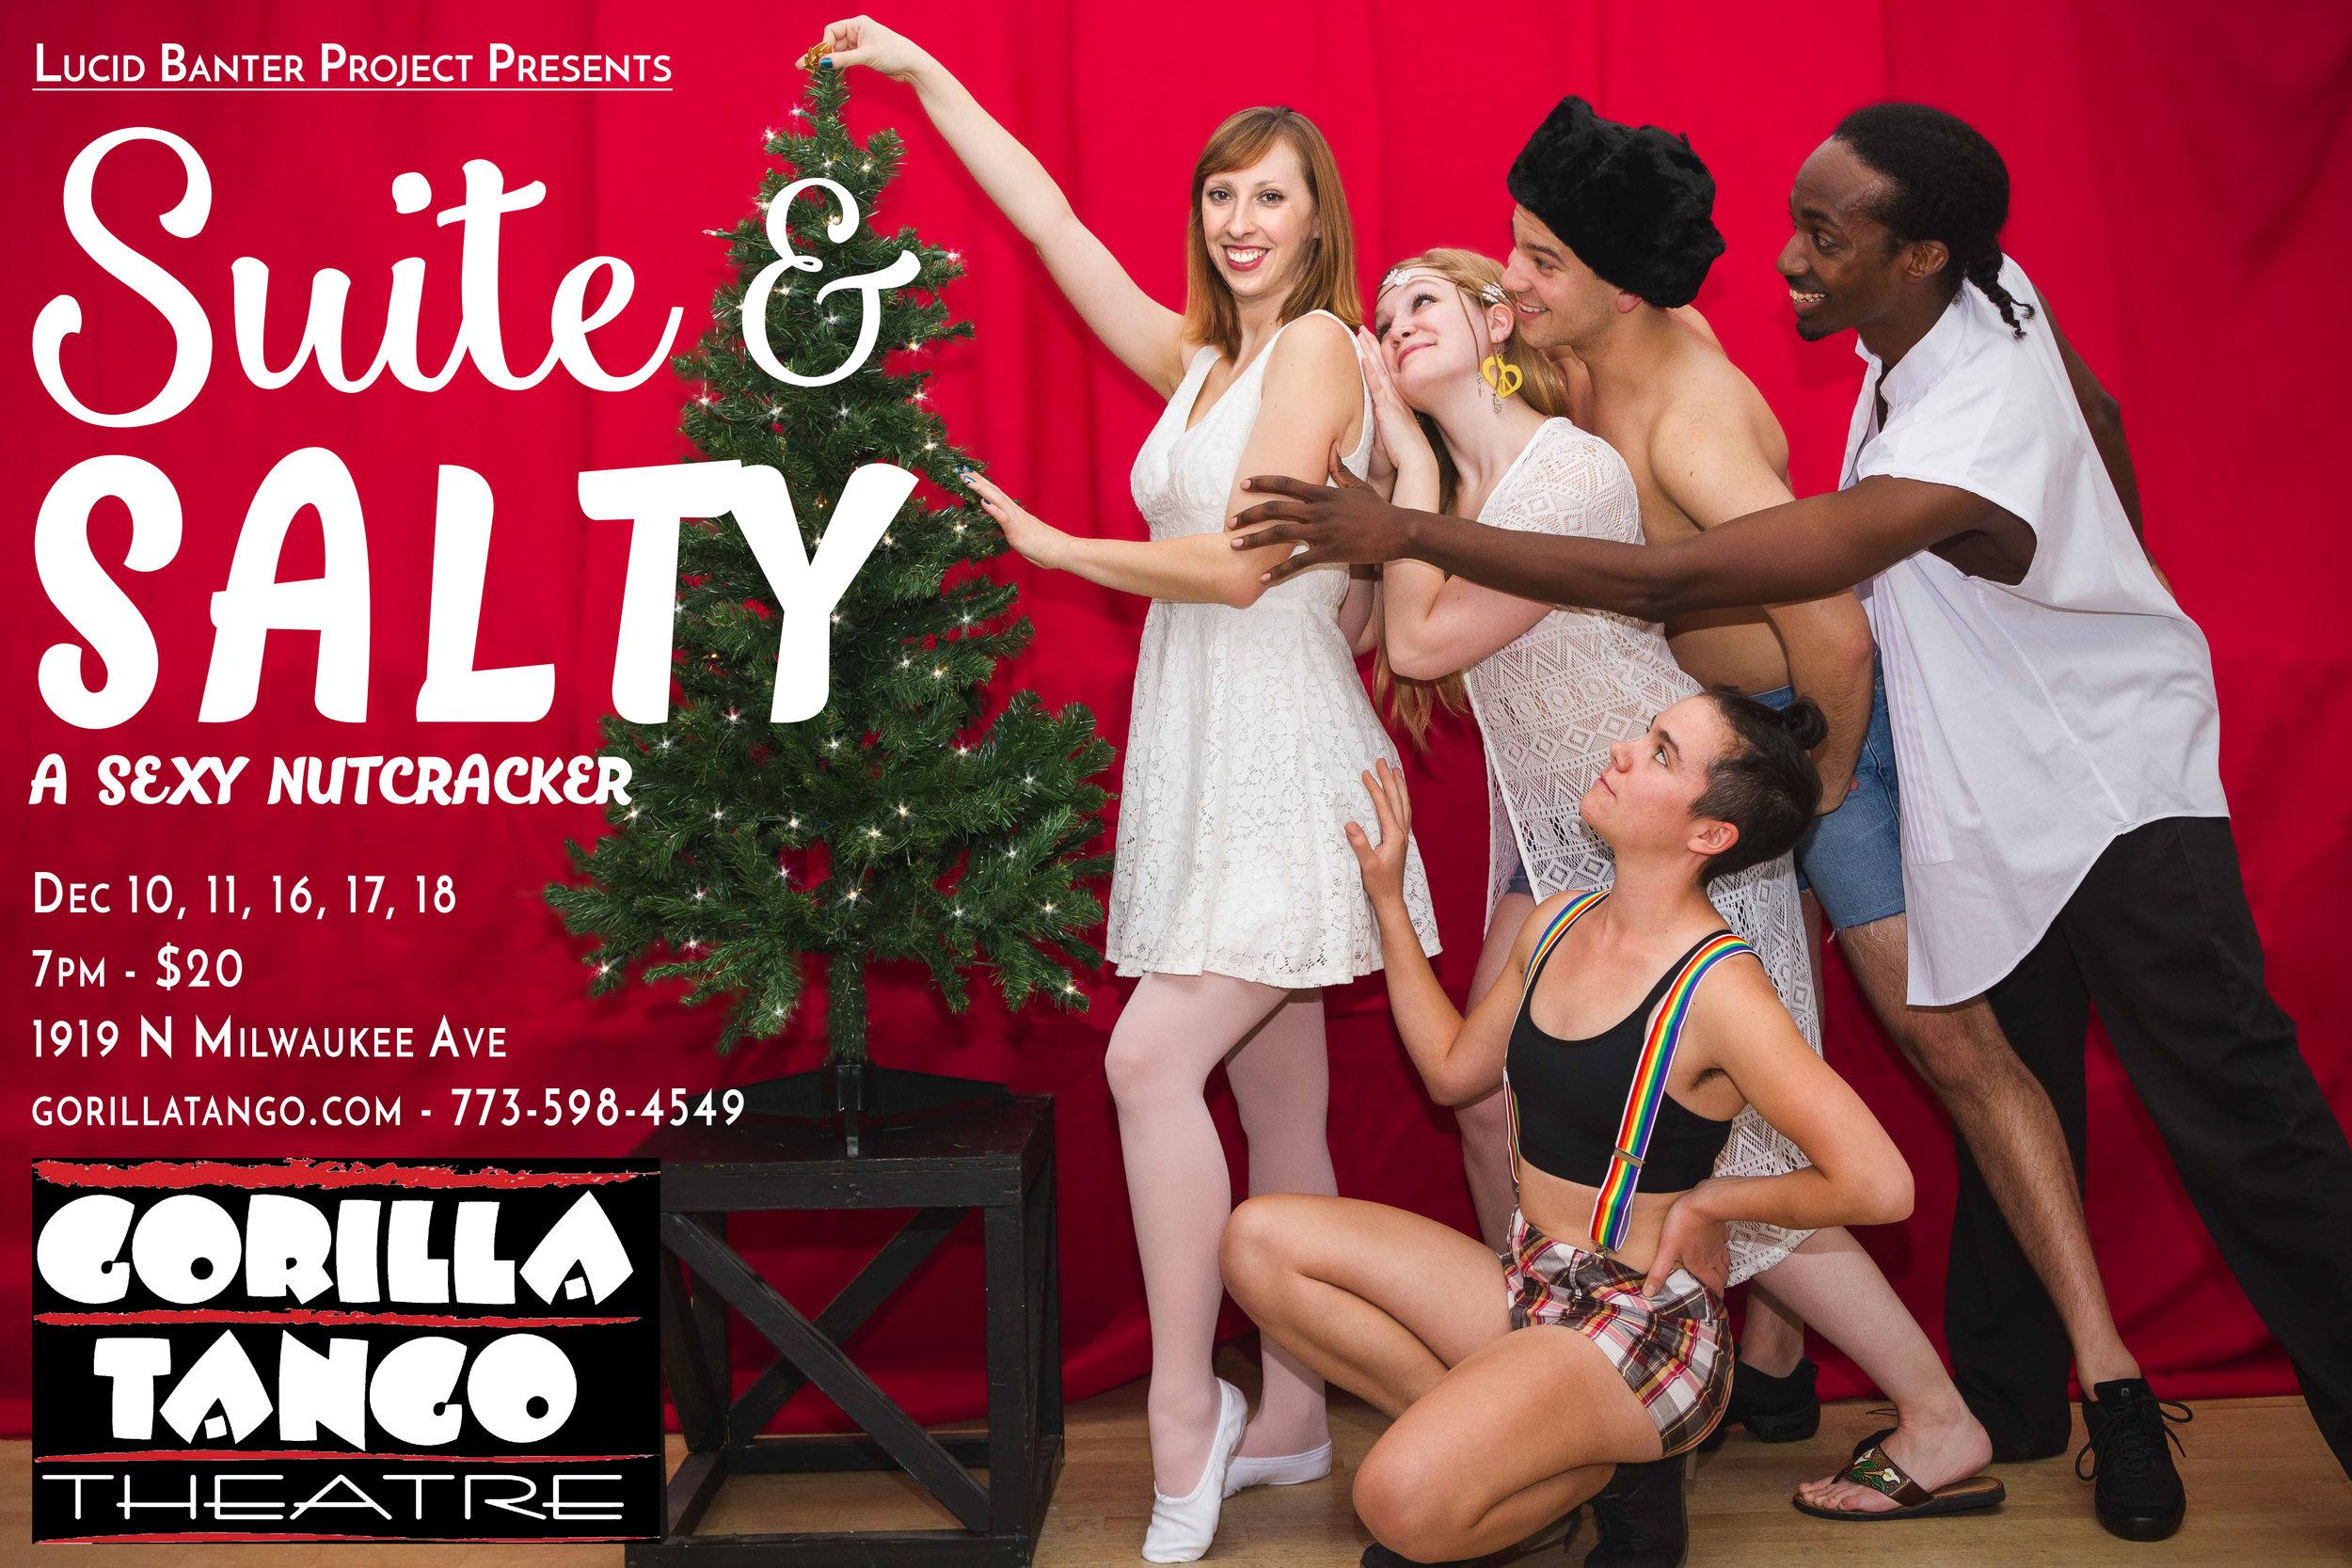 Suite & Salty: A Sexy Nutcracker   Premiered December 2016 - Gorilla Tango Theater  Photo: Josh Bartlett